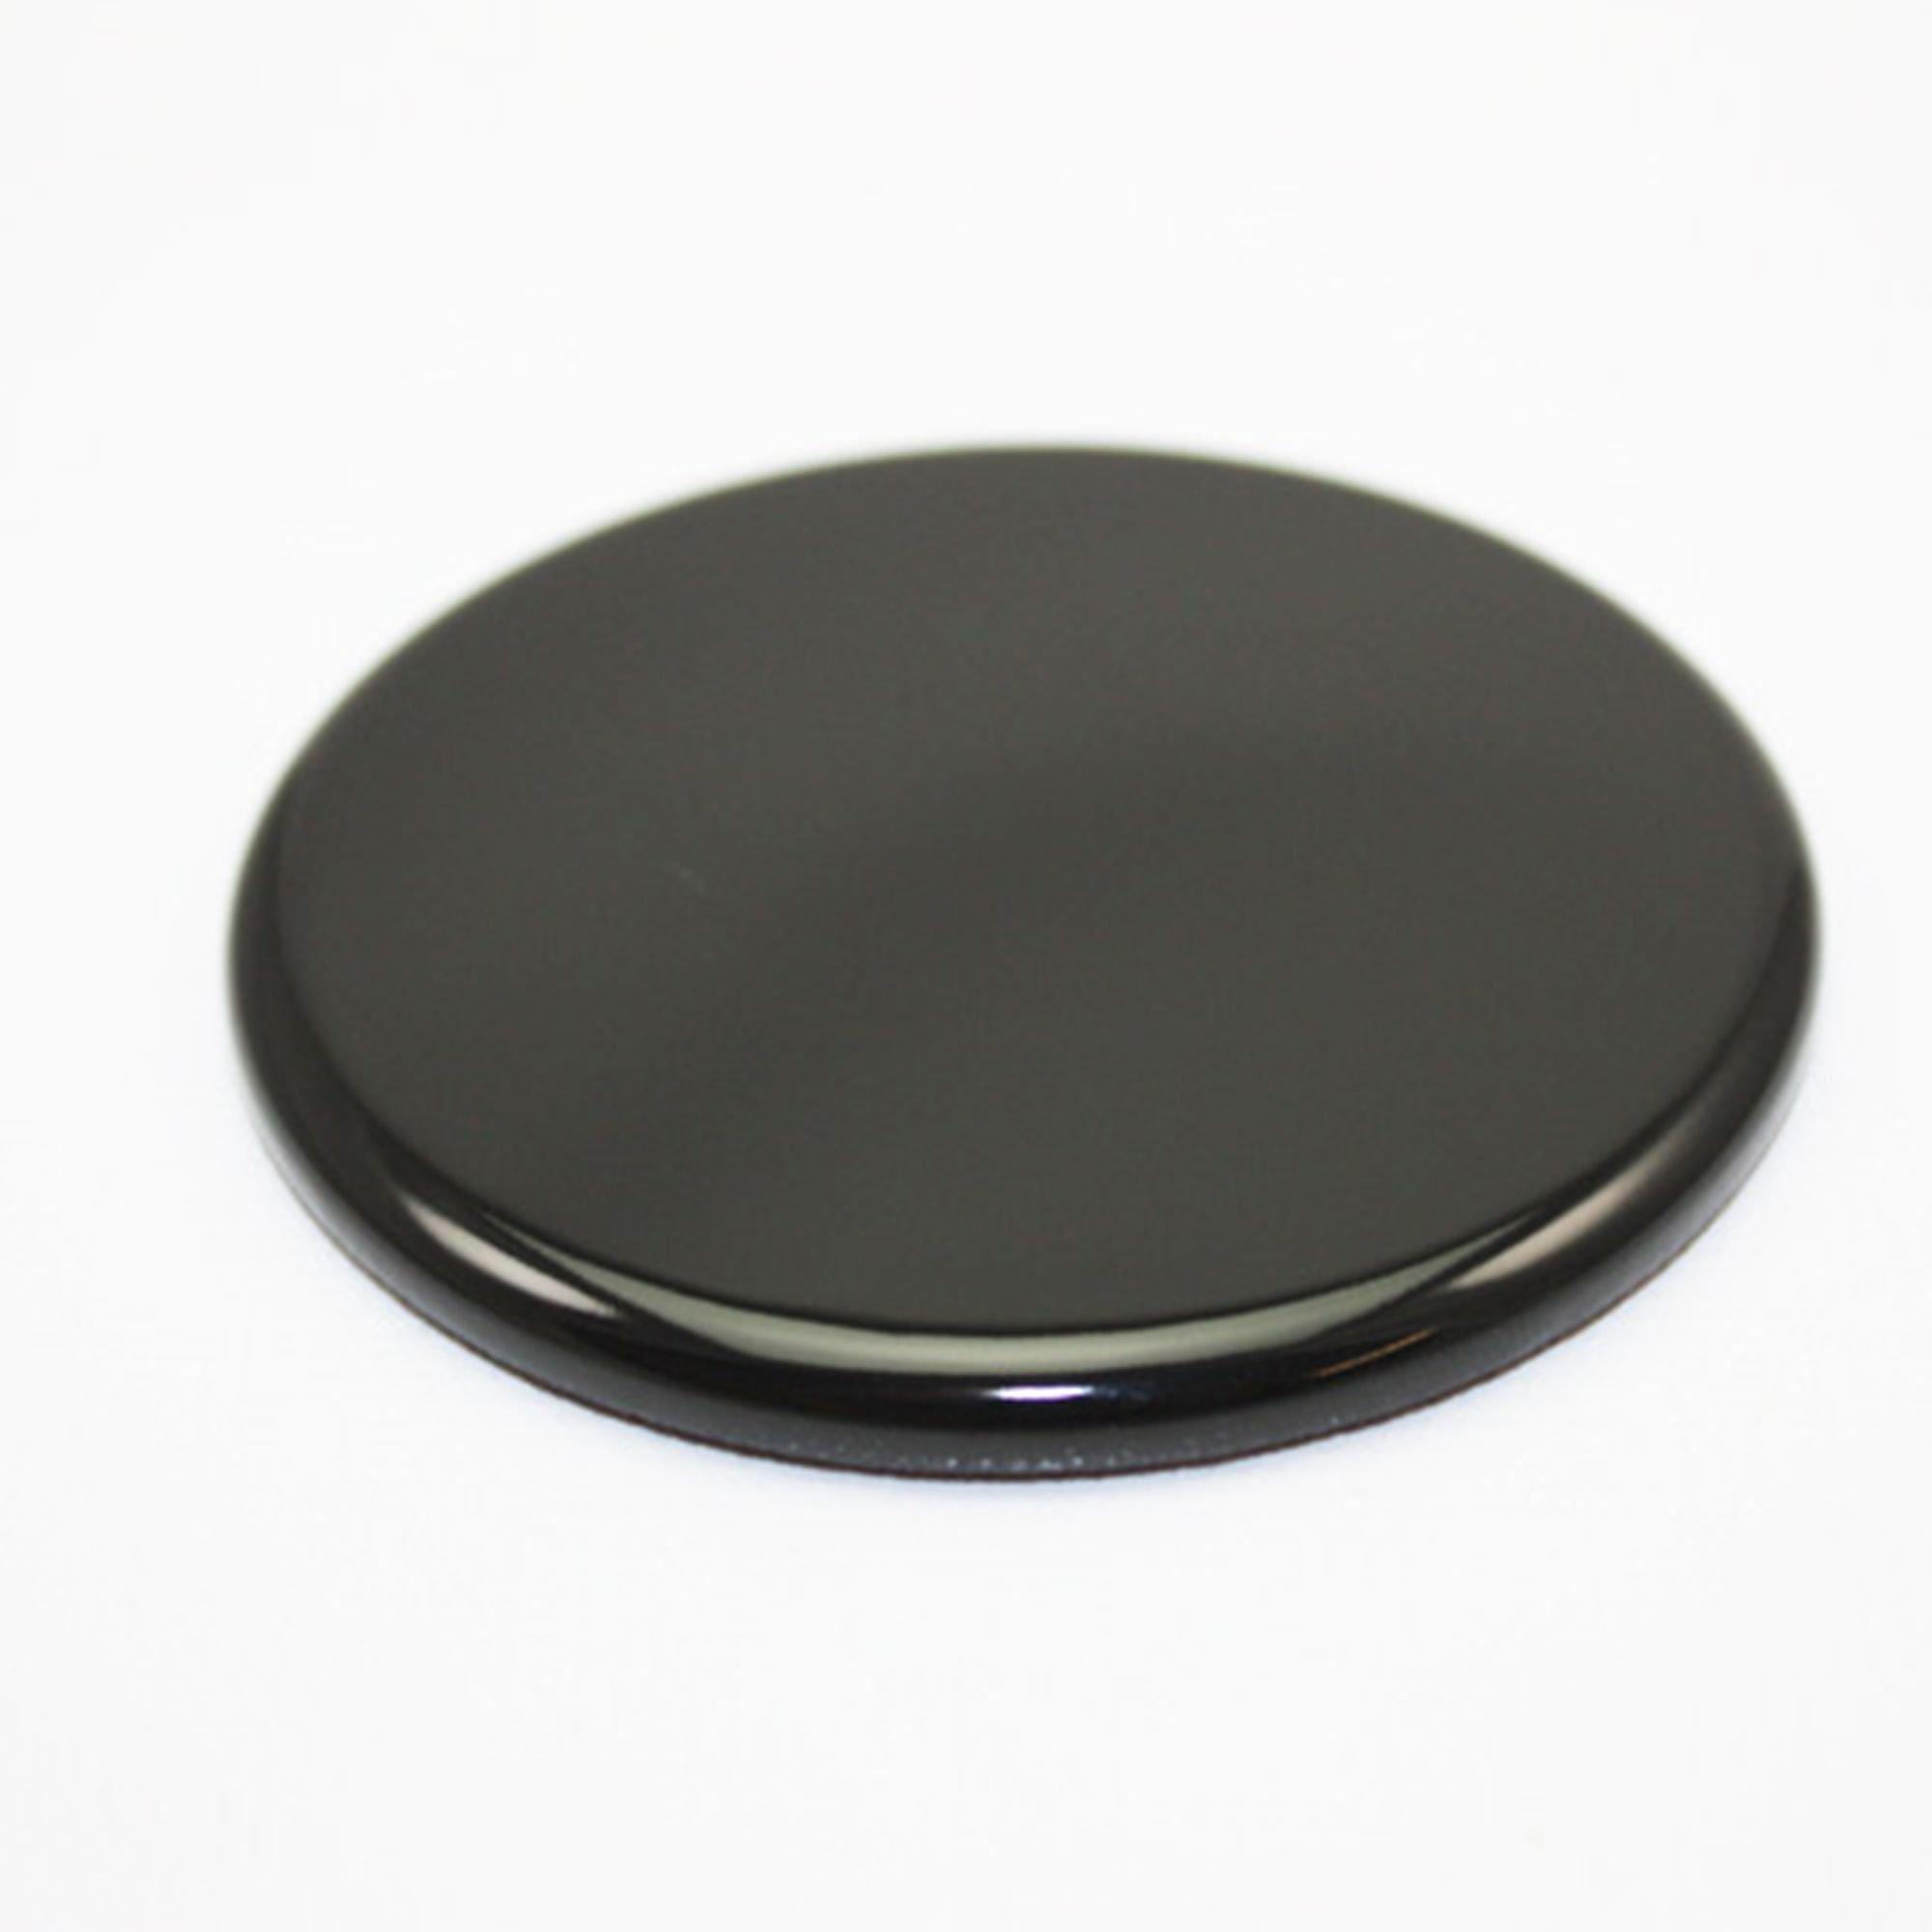 Whirlpool Part Number 3191901: Cap, Burner (LF, LR, RF) (Black)